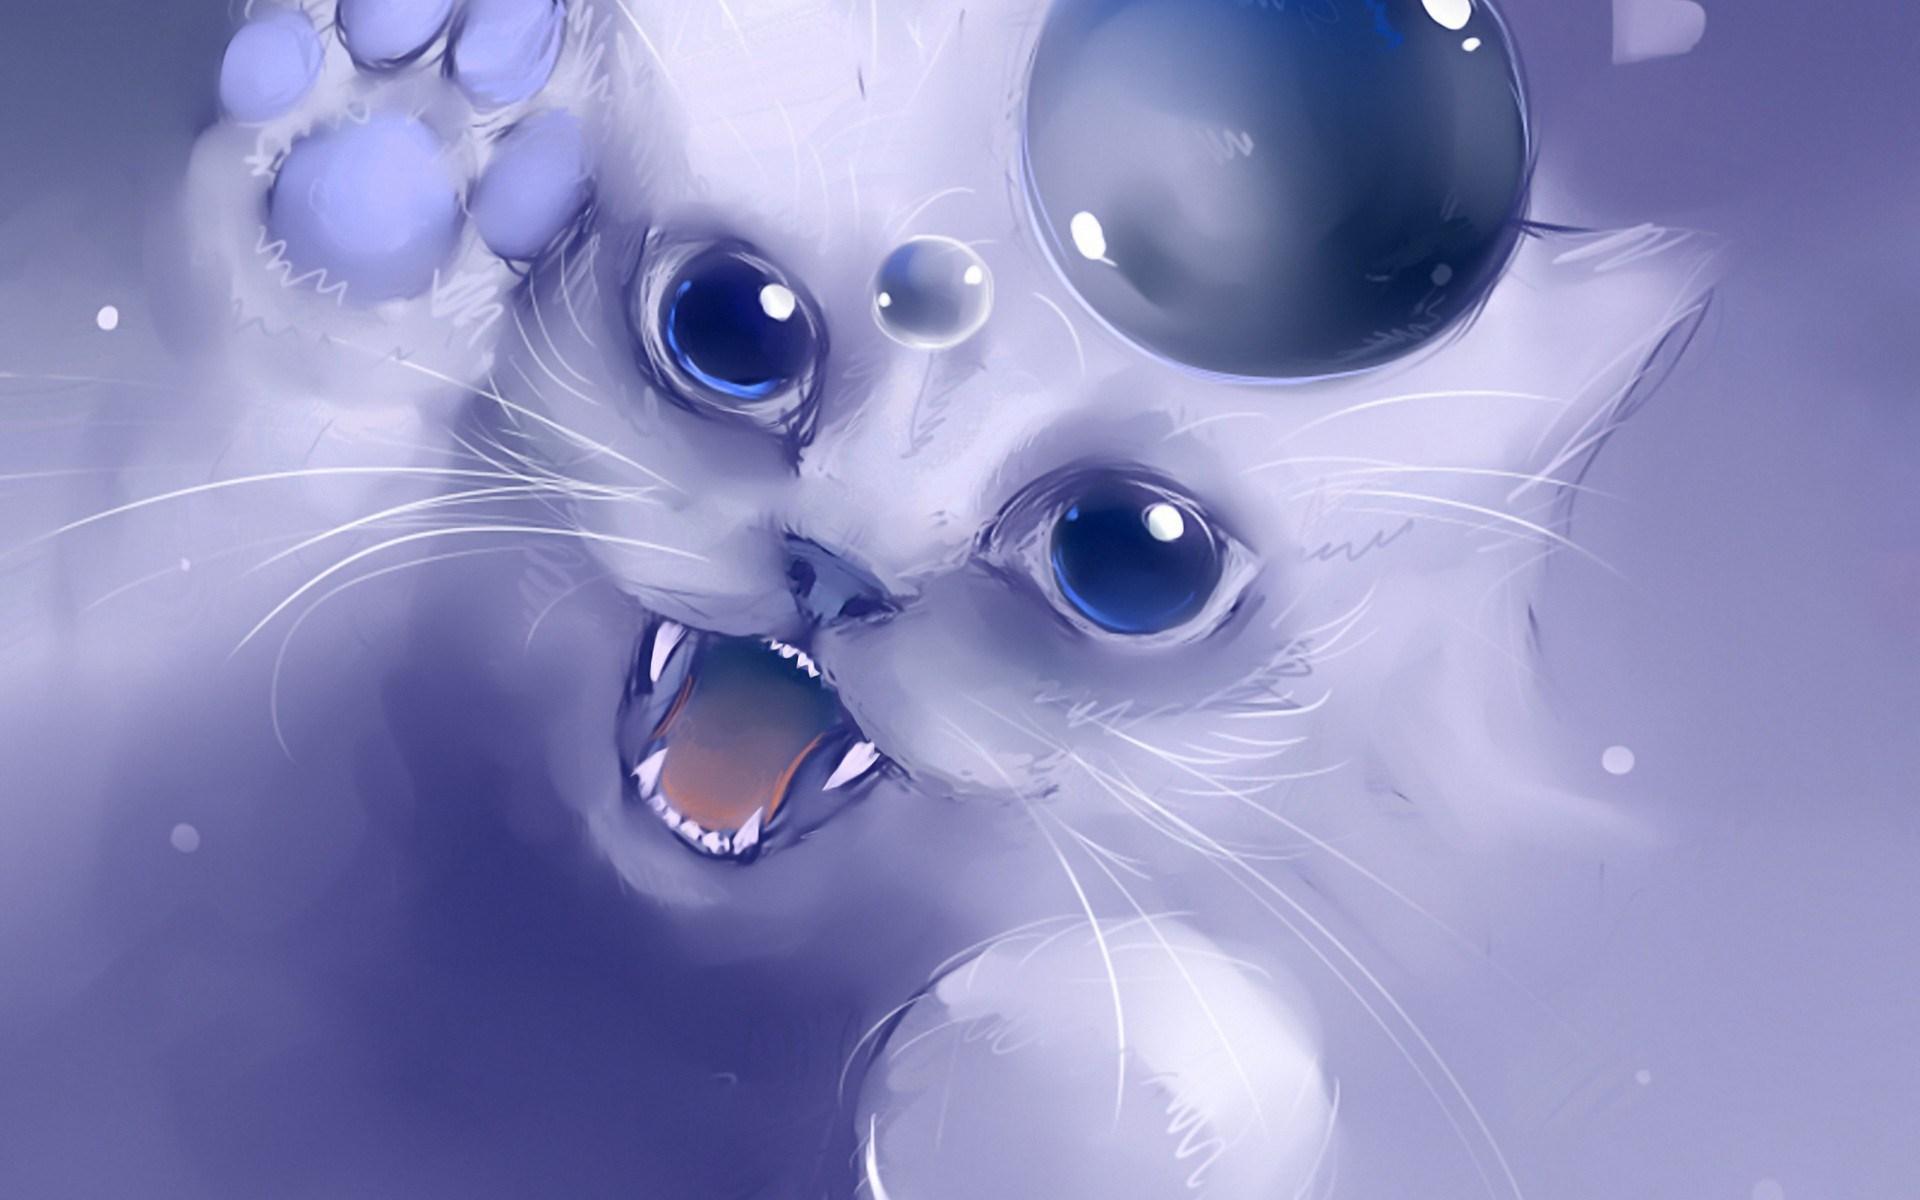 Drawn wallpaper cute anime cat Cat cat Anime drawing kitty